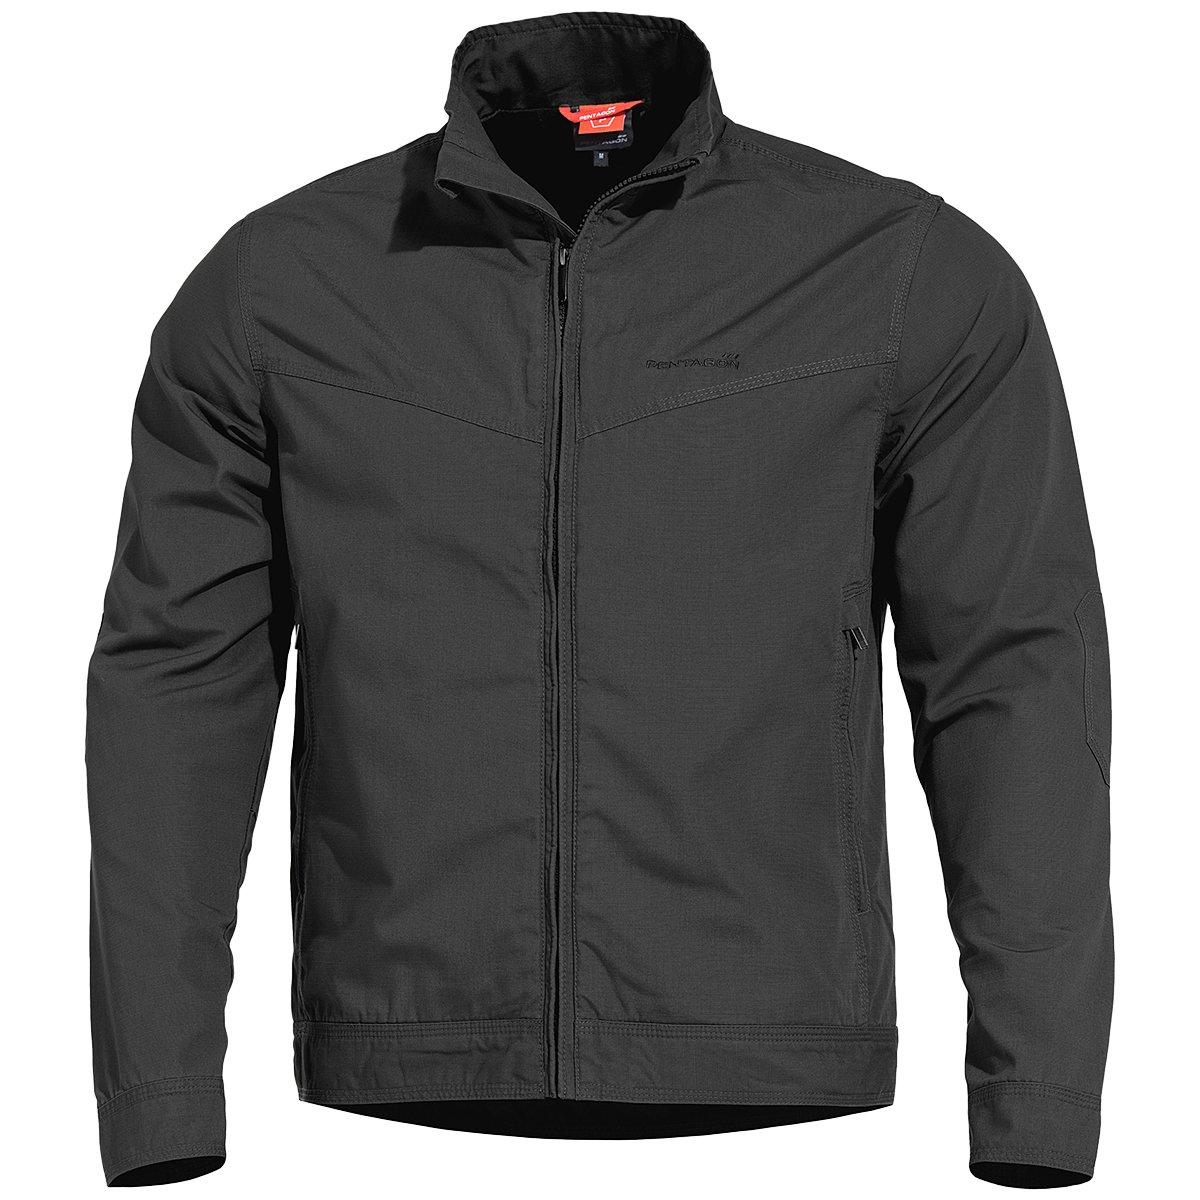 Pentagon Men's Nostalgia Jacket Ripstop Black Size L